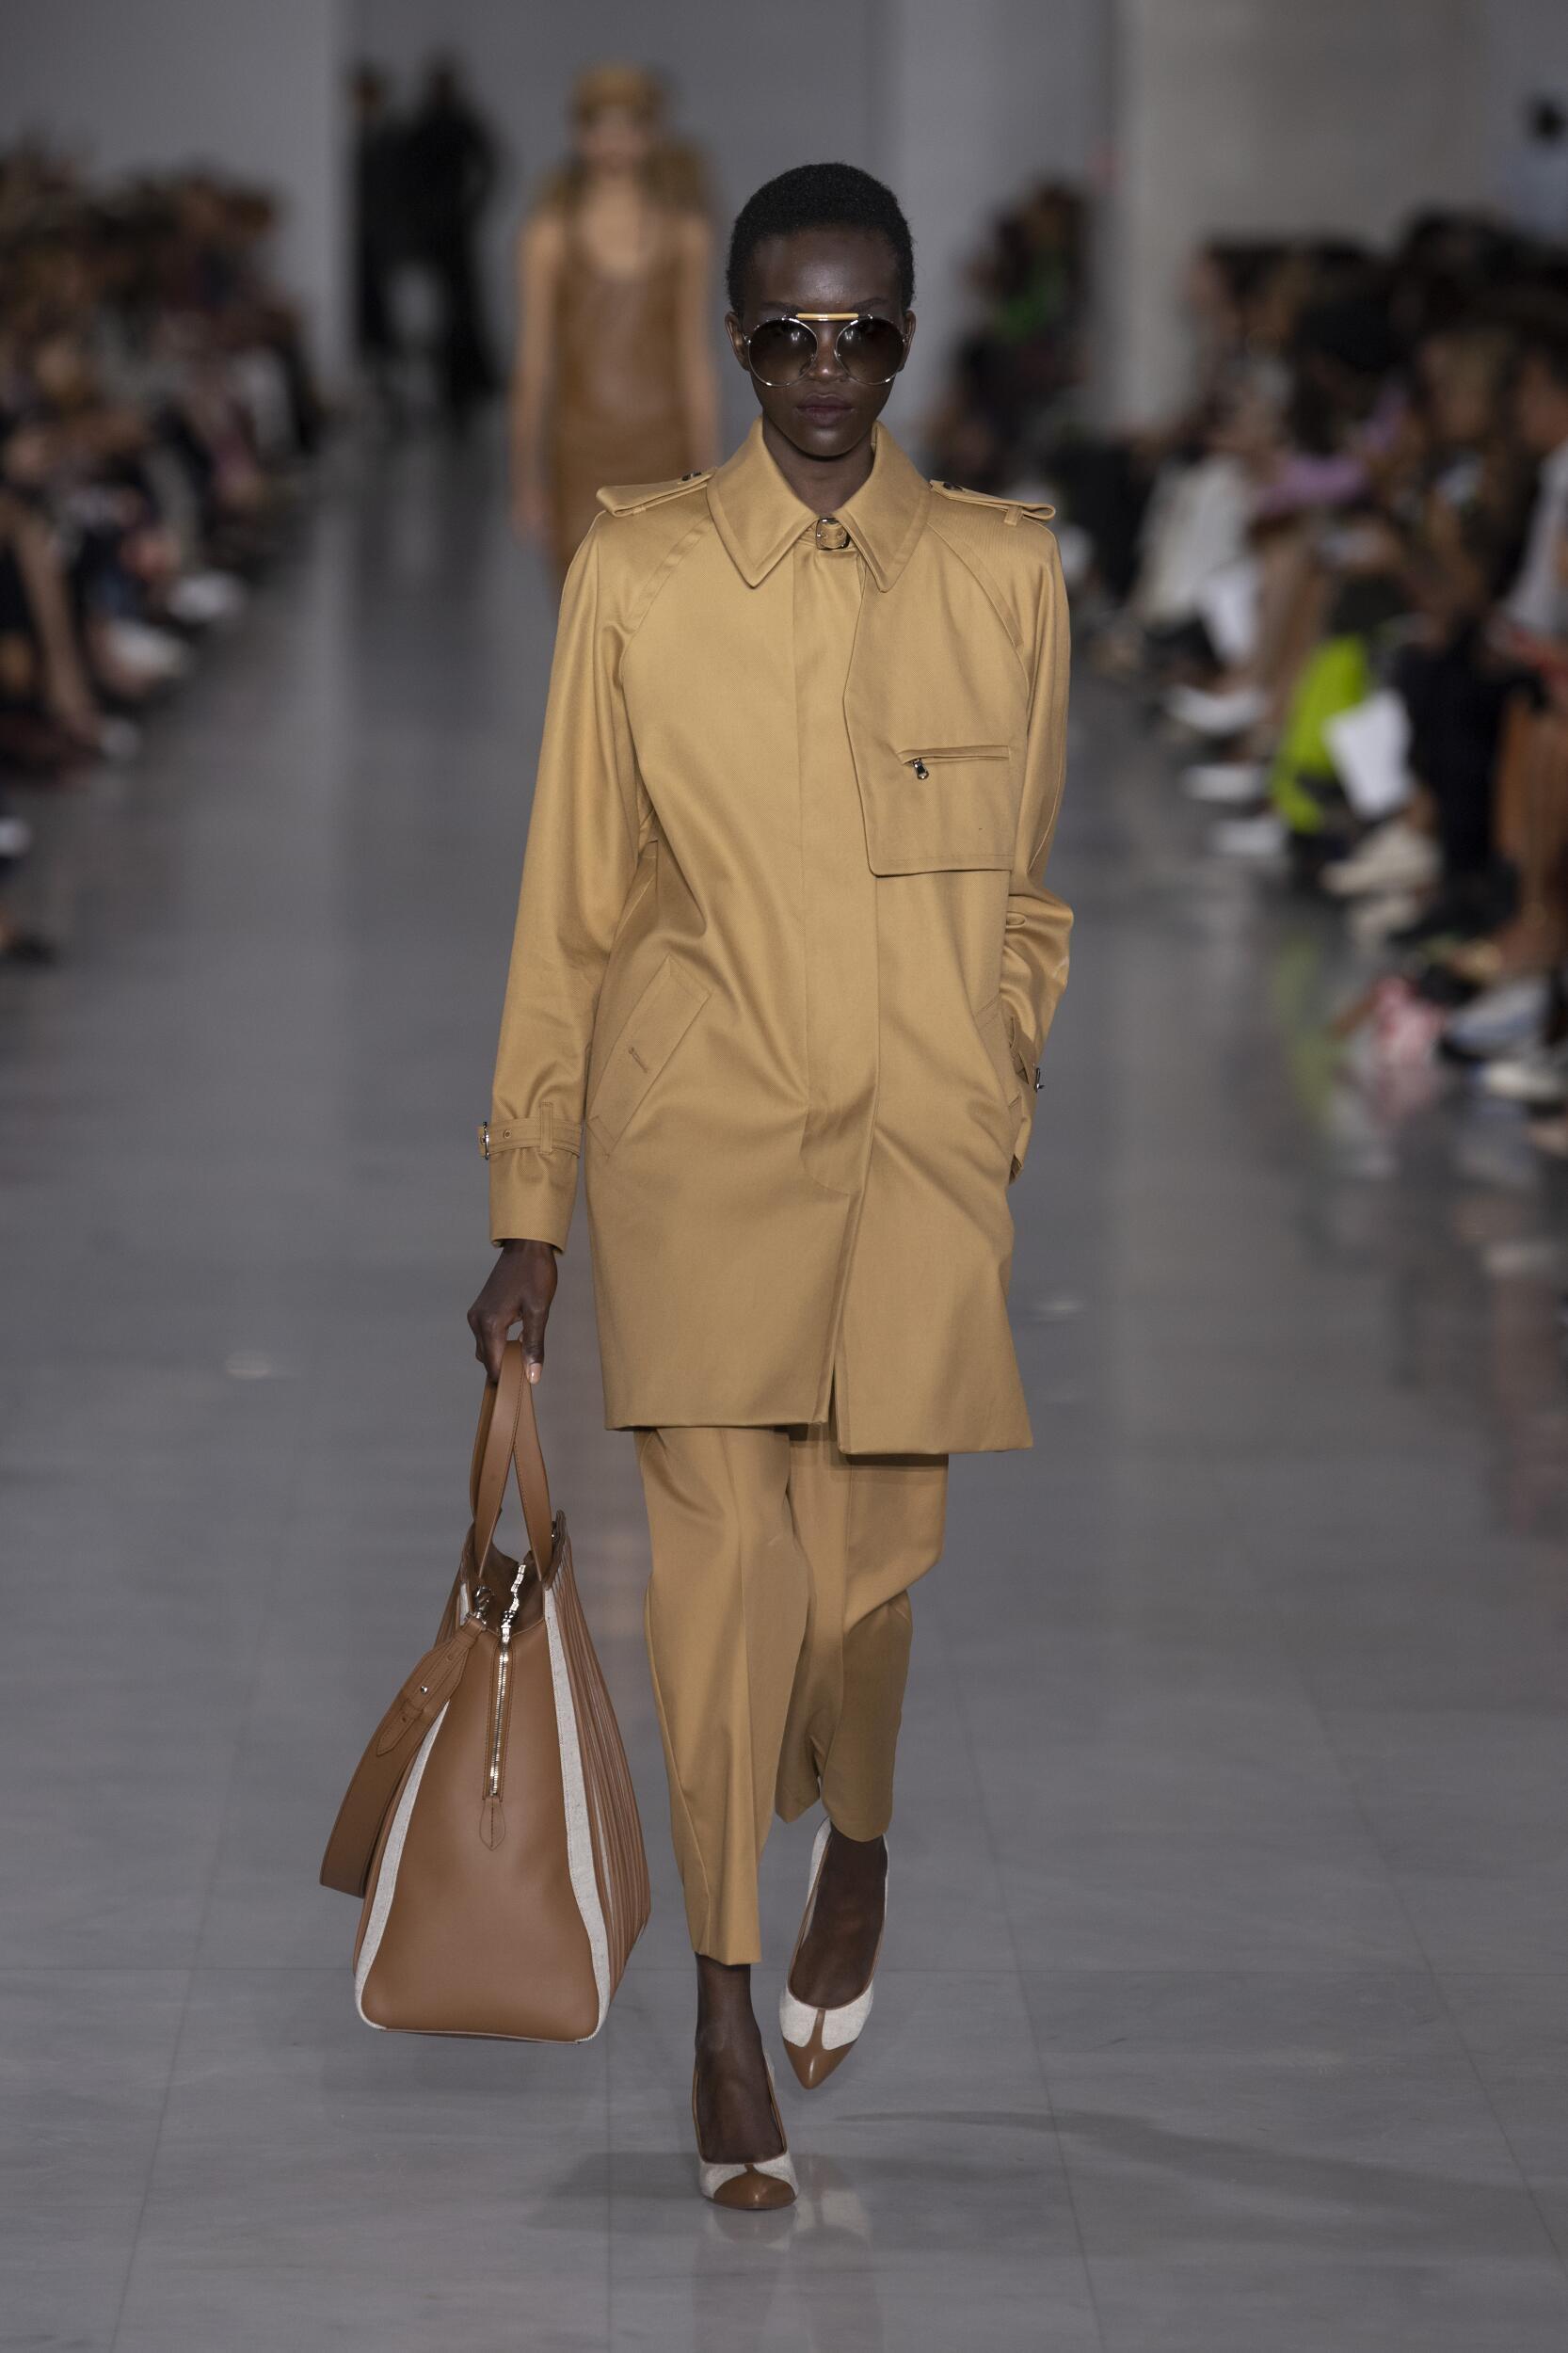 Fashion Model Woman Max Mara Catwalk